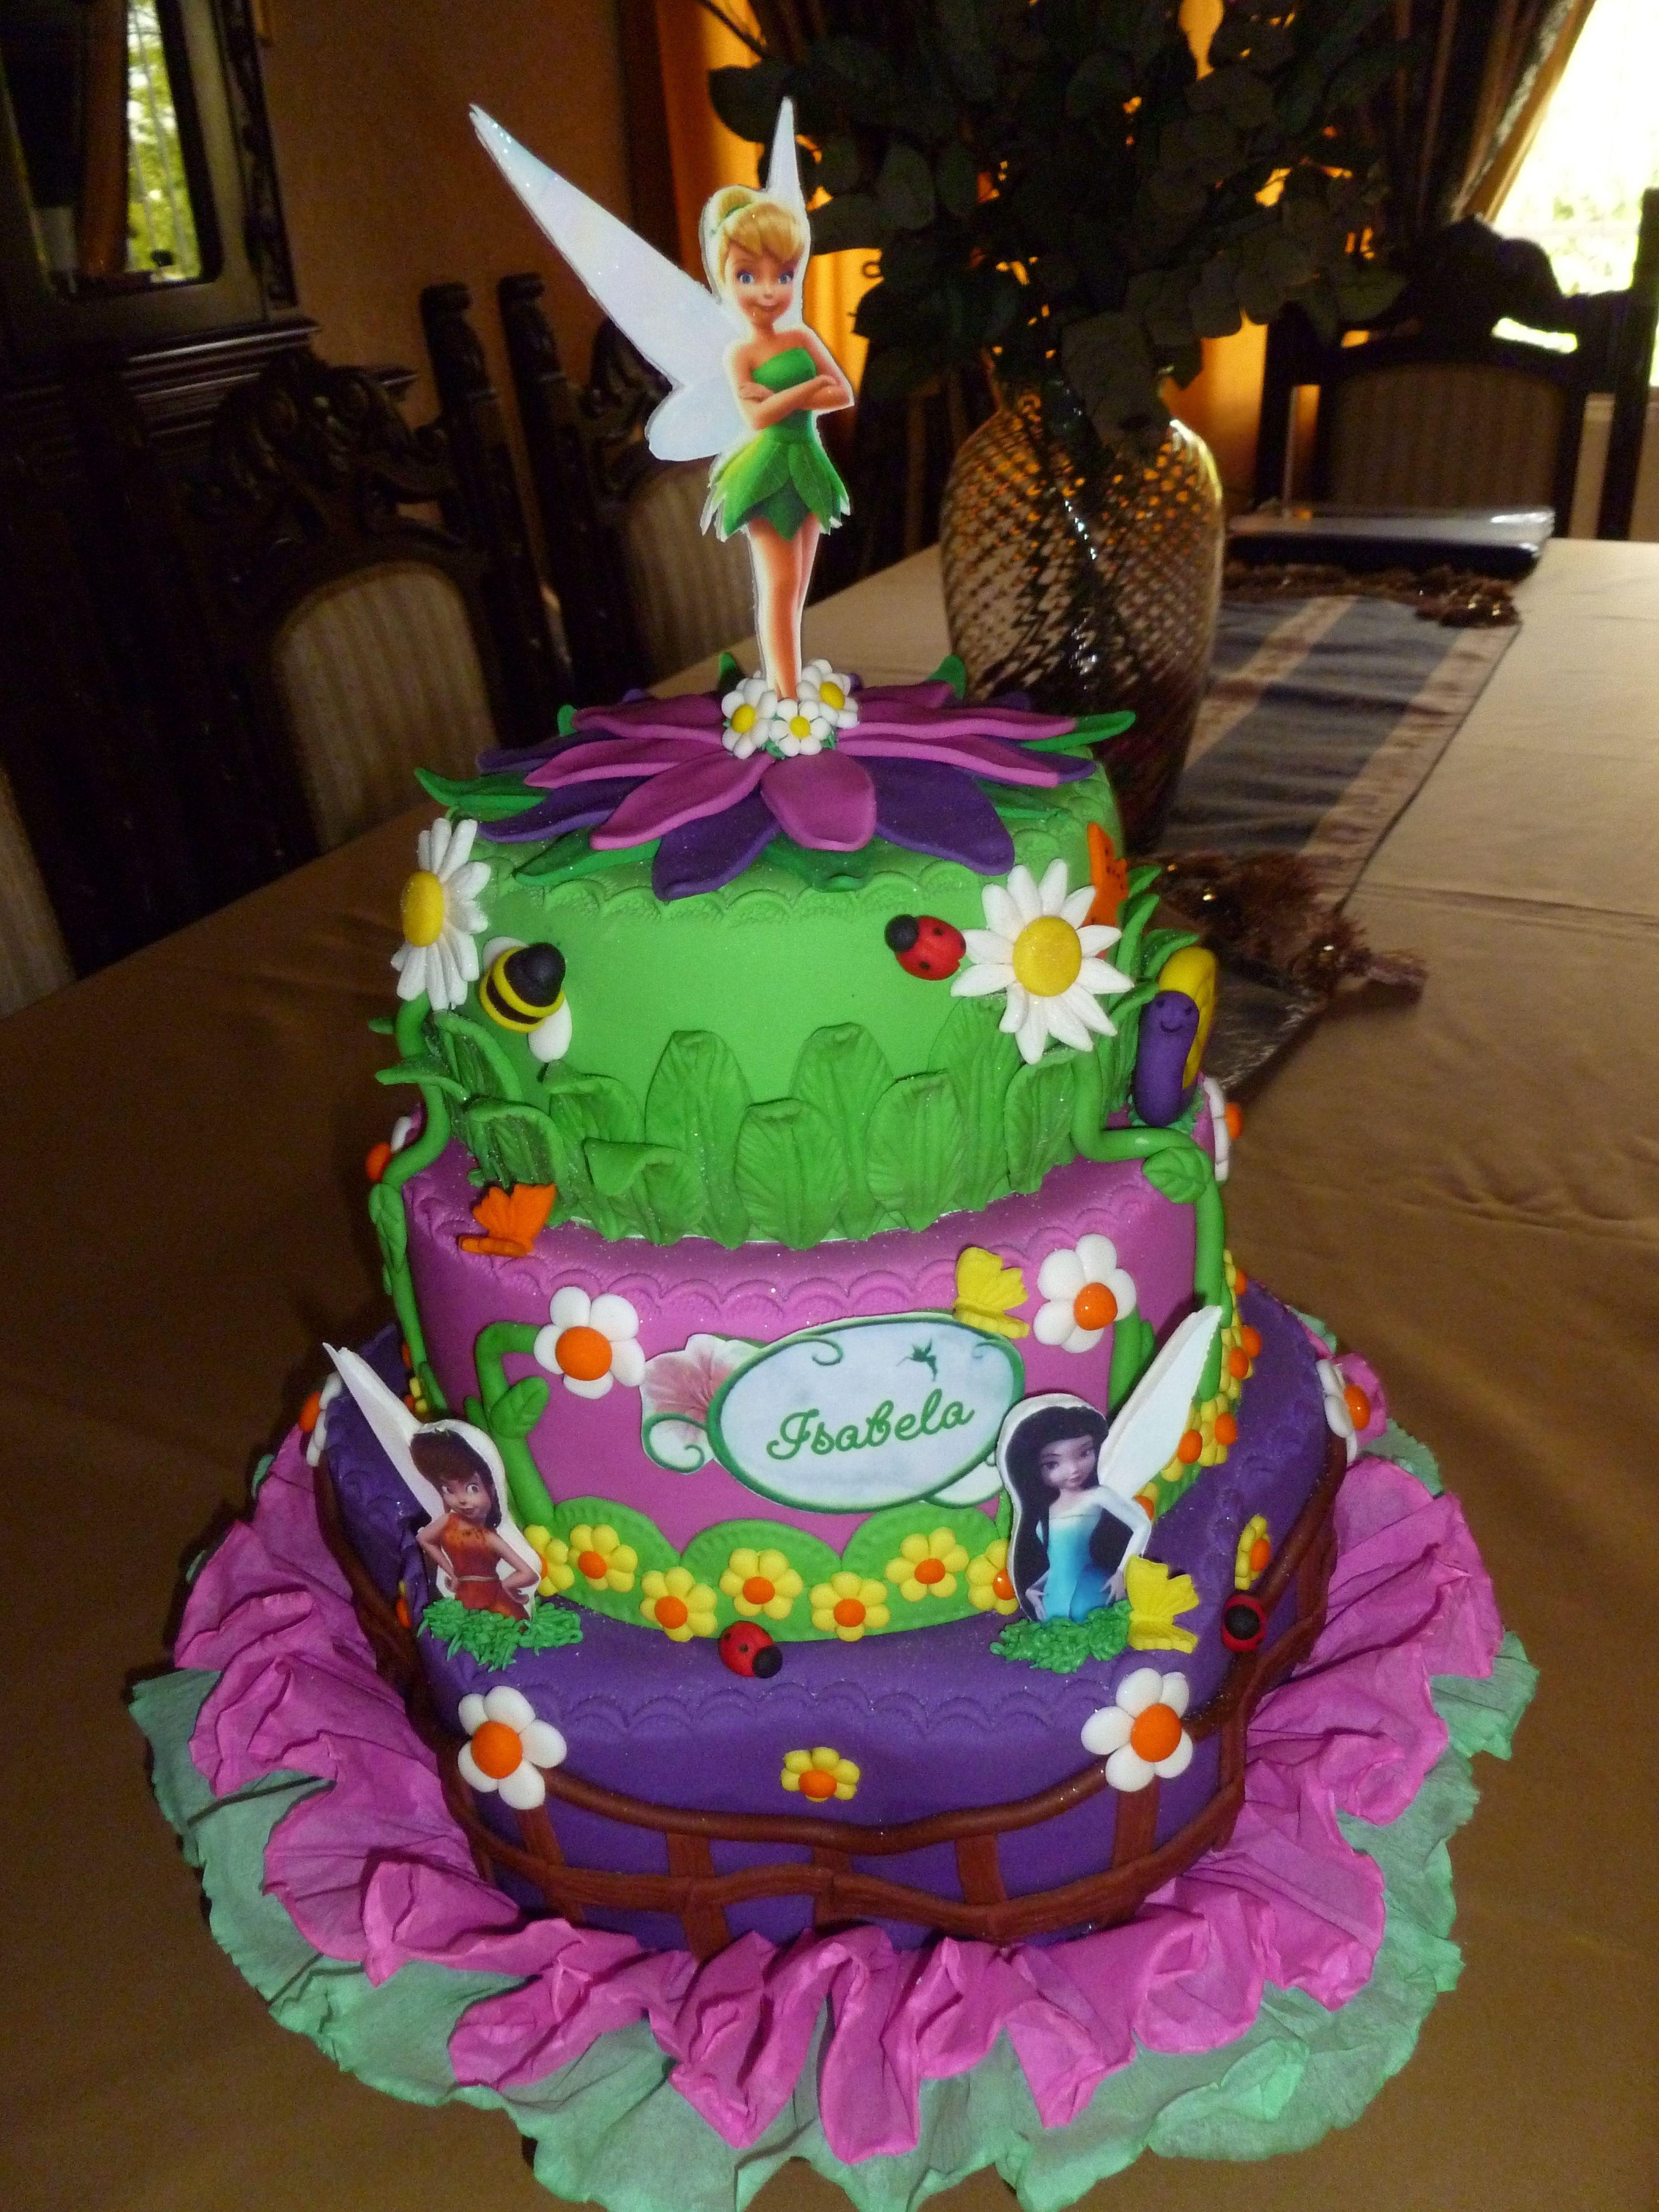 Torta de Tinkerbell | tortas decoradas | Pinterest | Campanilla